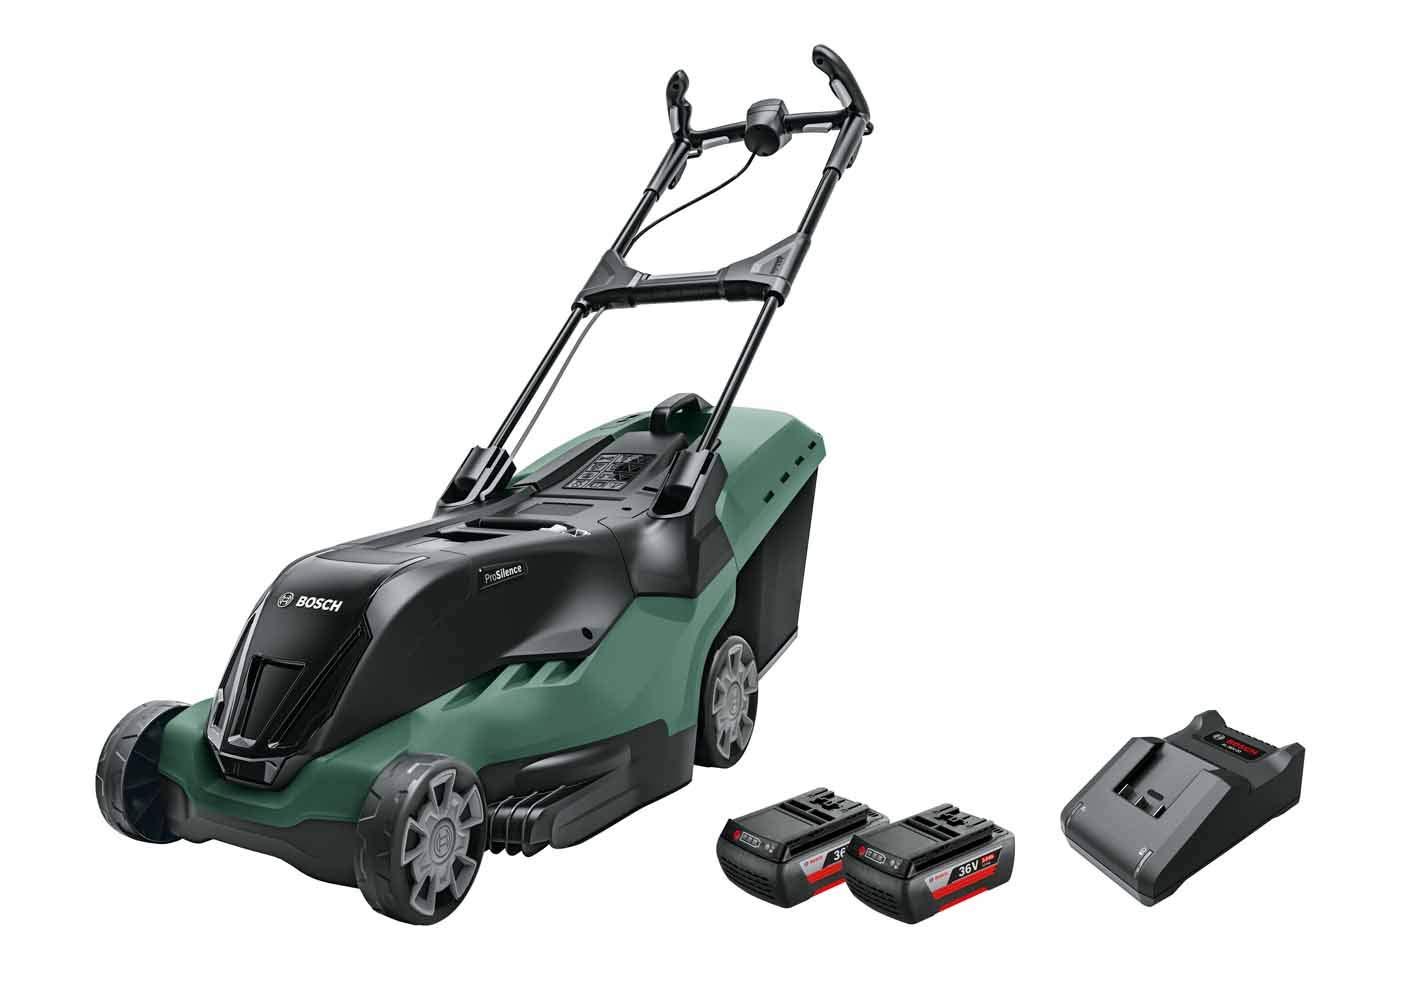 Bosch-Akku-Rasenmher-AdvancedRotak-36-660-2×20-Ah-Akkus-36-Volt-System-im-Karton